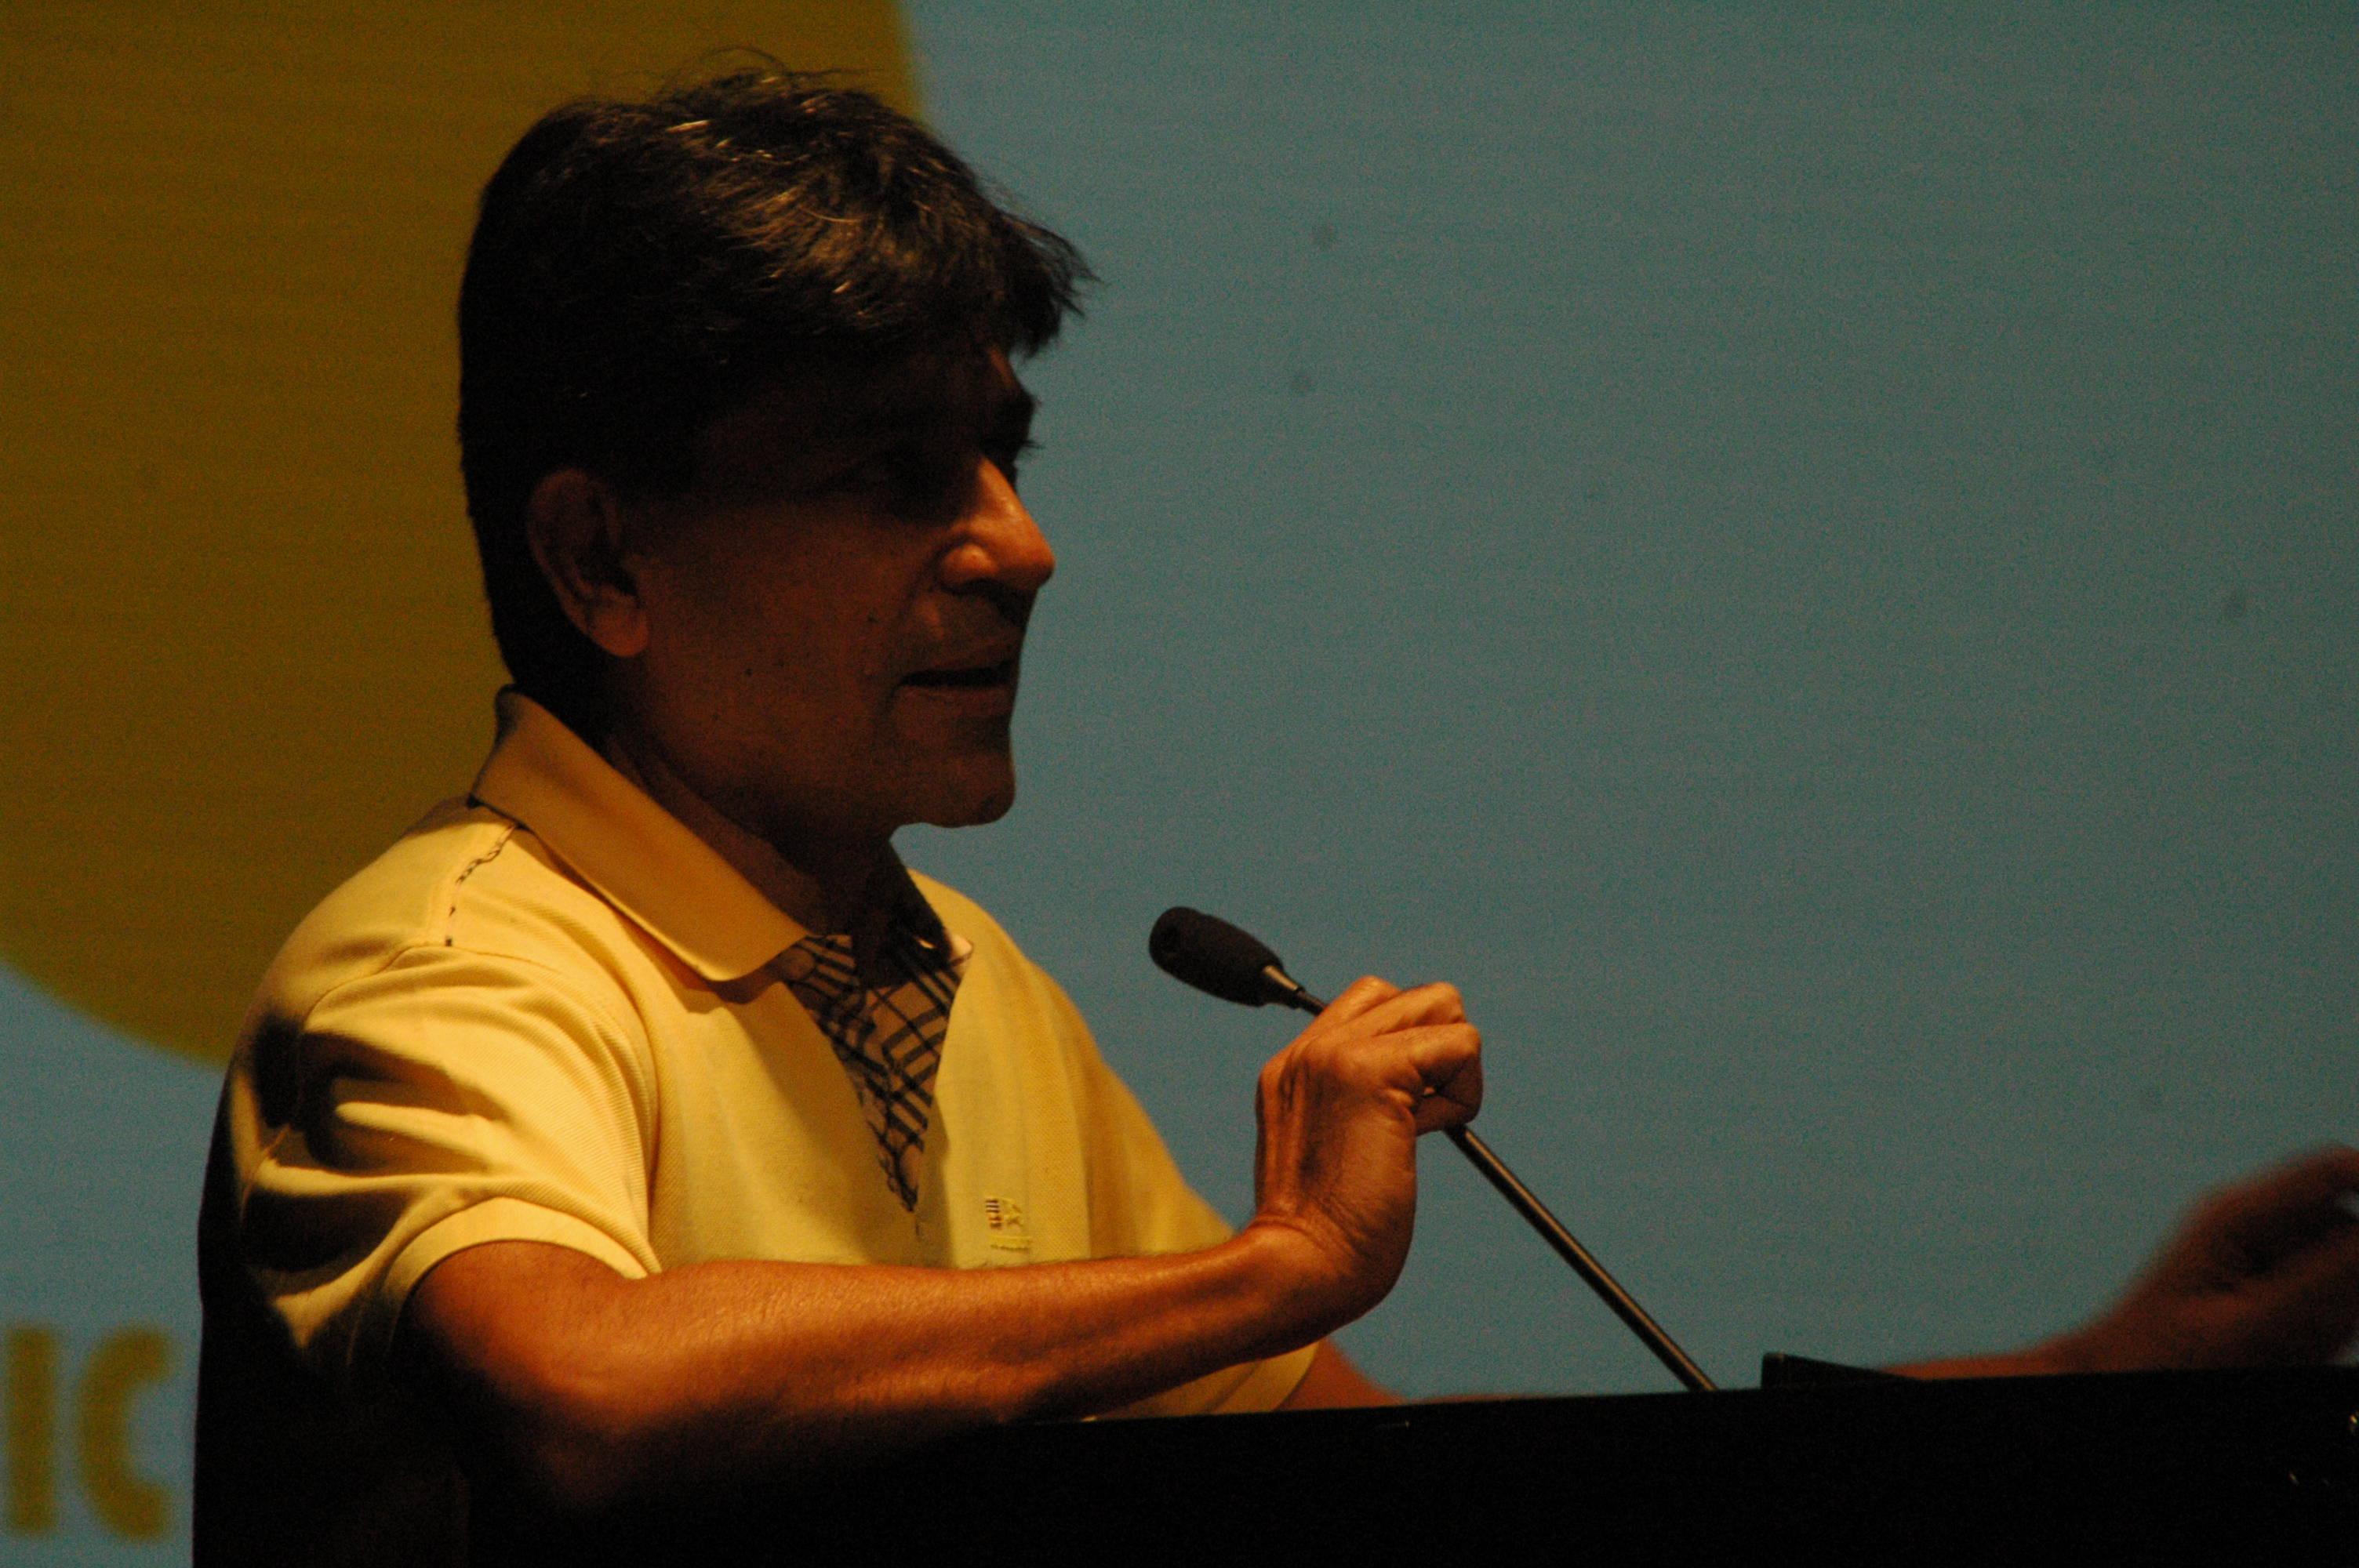 Geet Sethi, eight time world billiards champion - founder OGQ